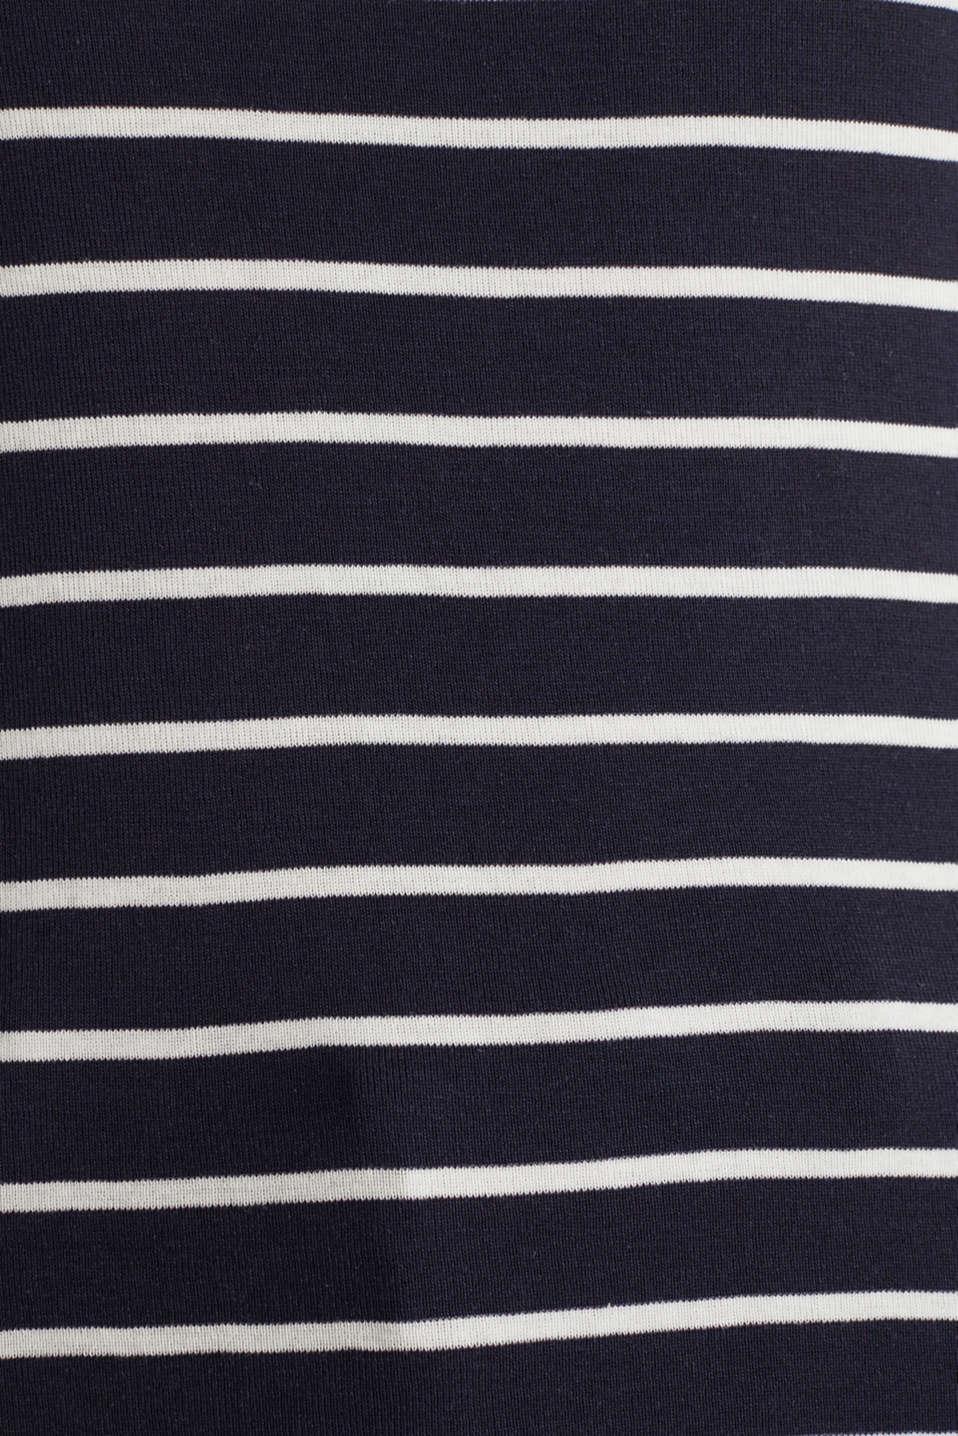 Striped T-shirt, organic cotton, NAVY, detail image number 4